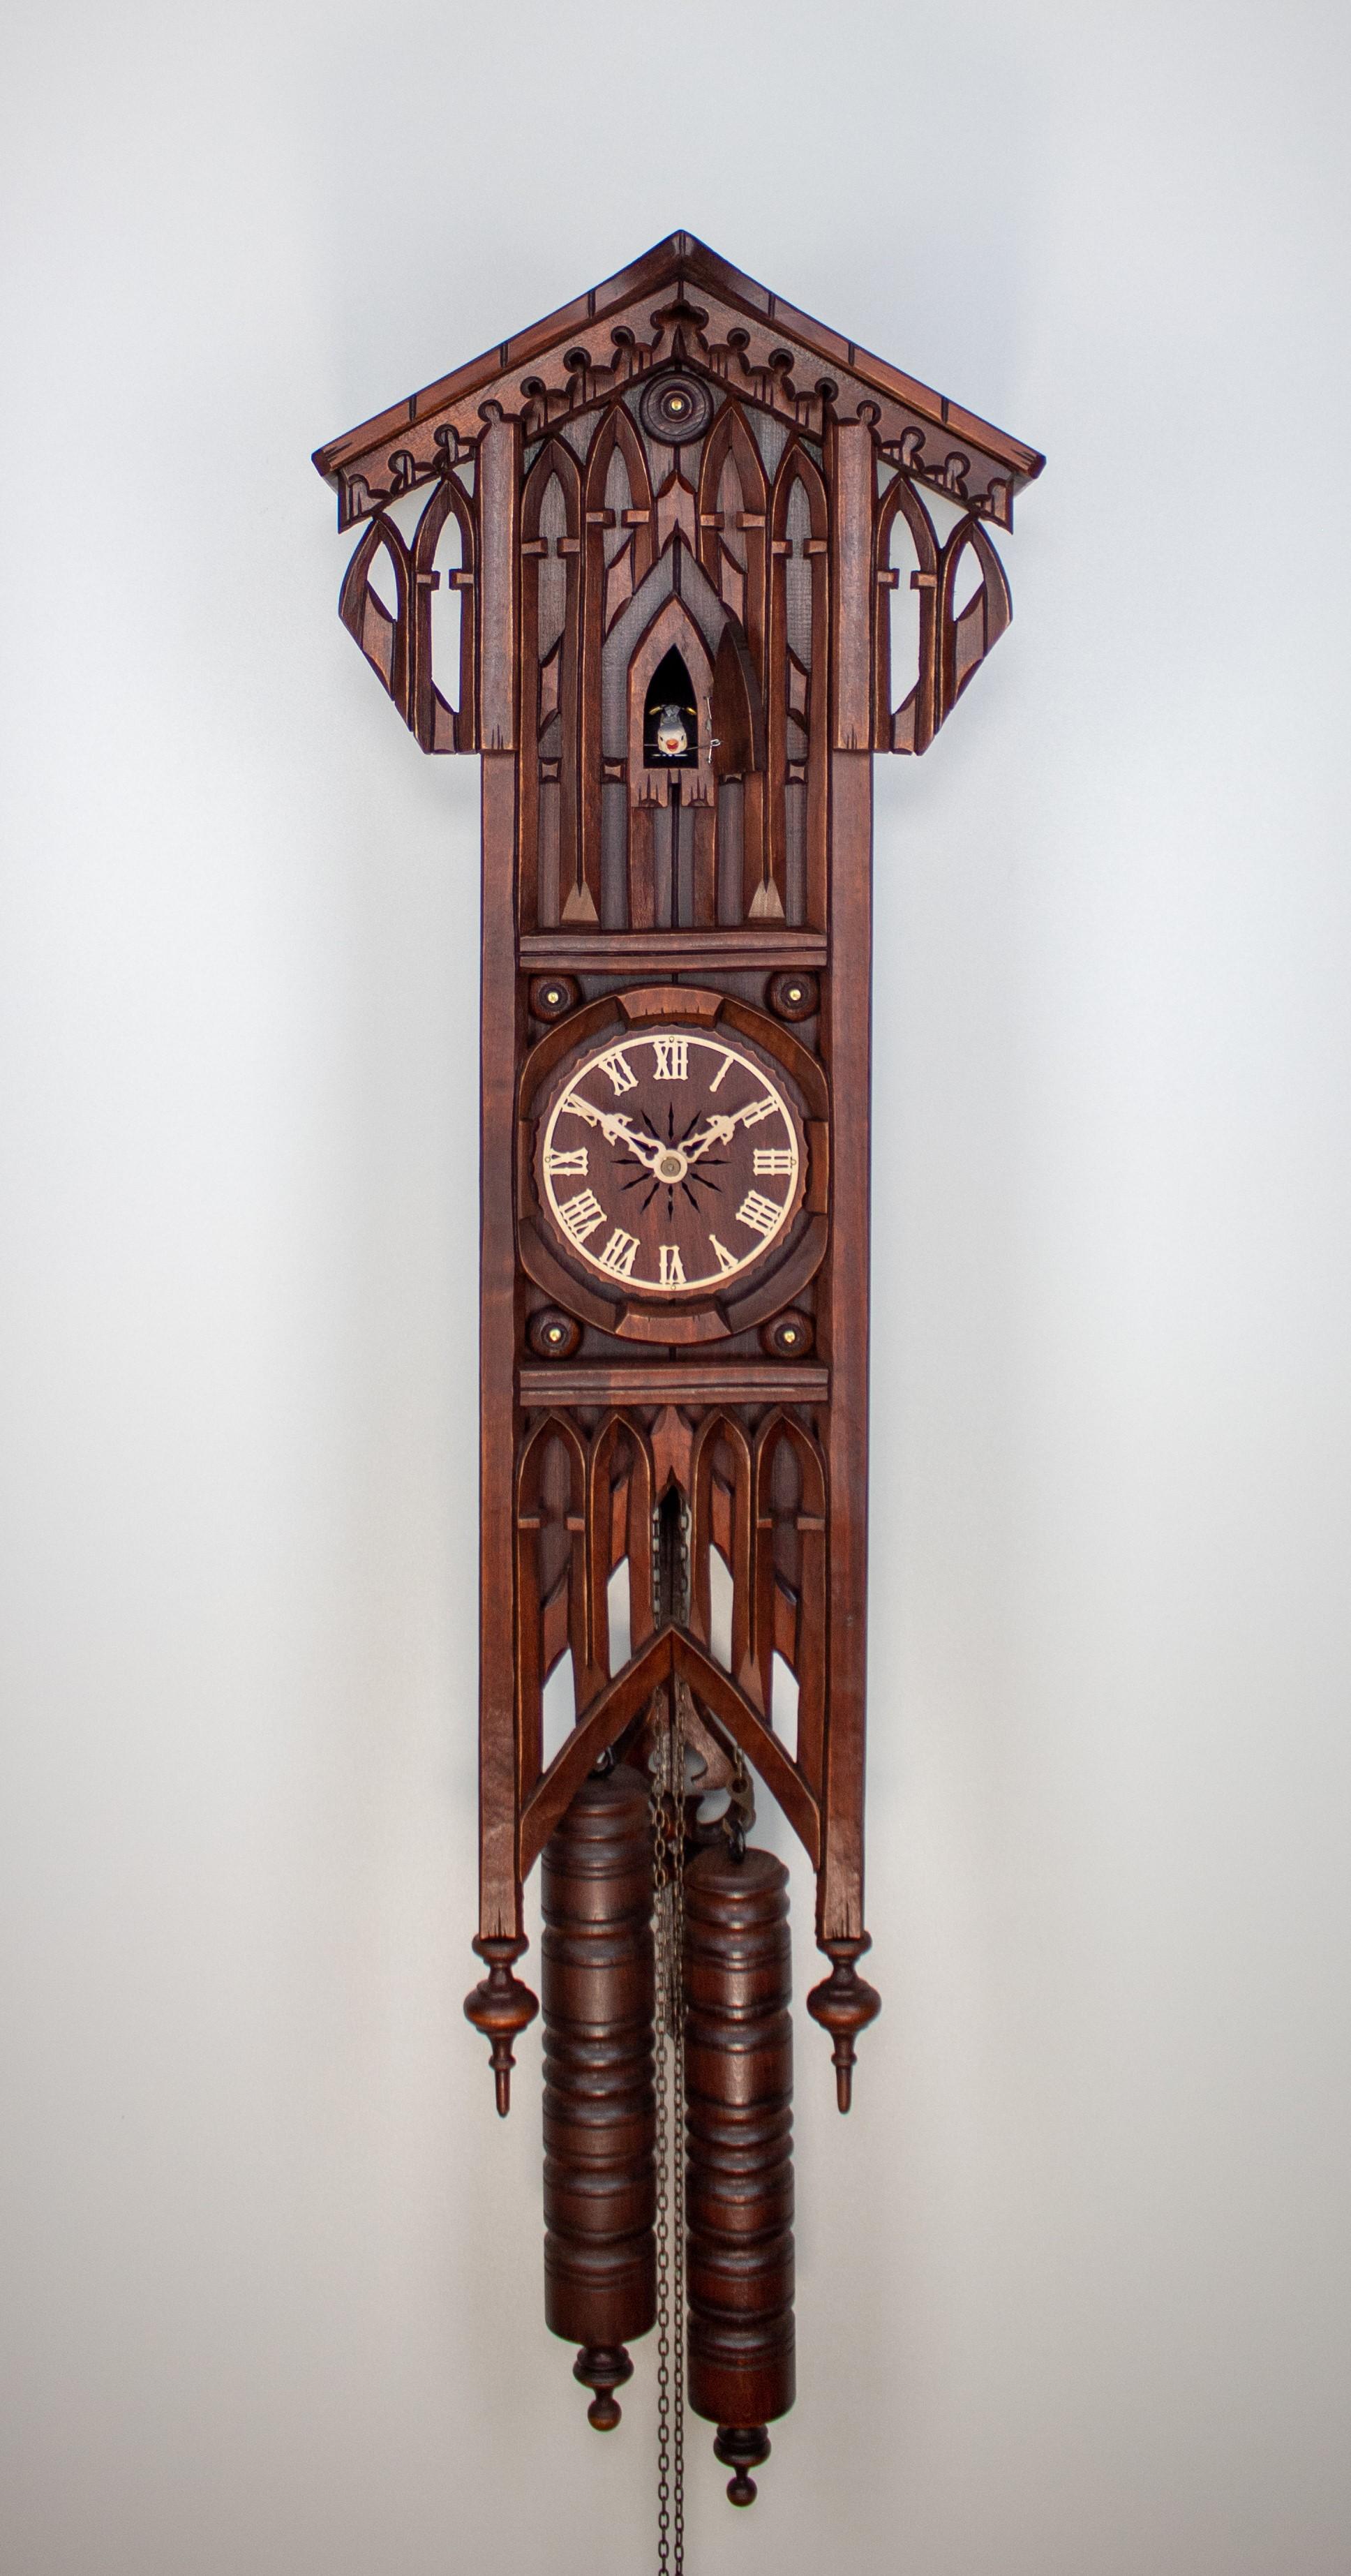 8 Days Cuckoo Clock gothic style